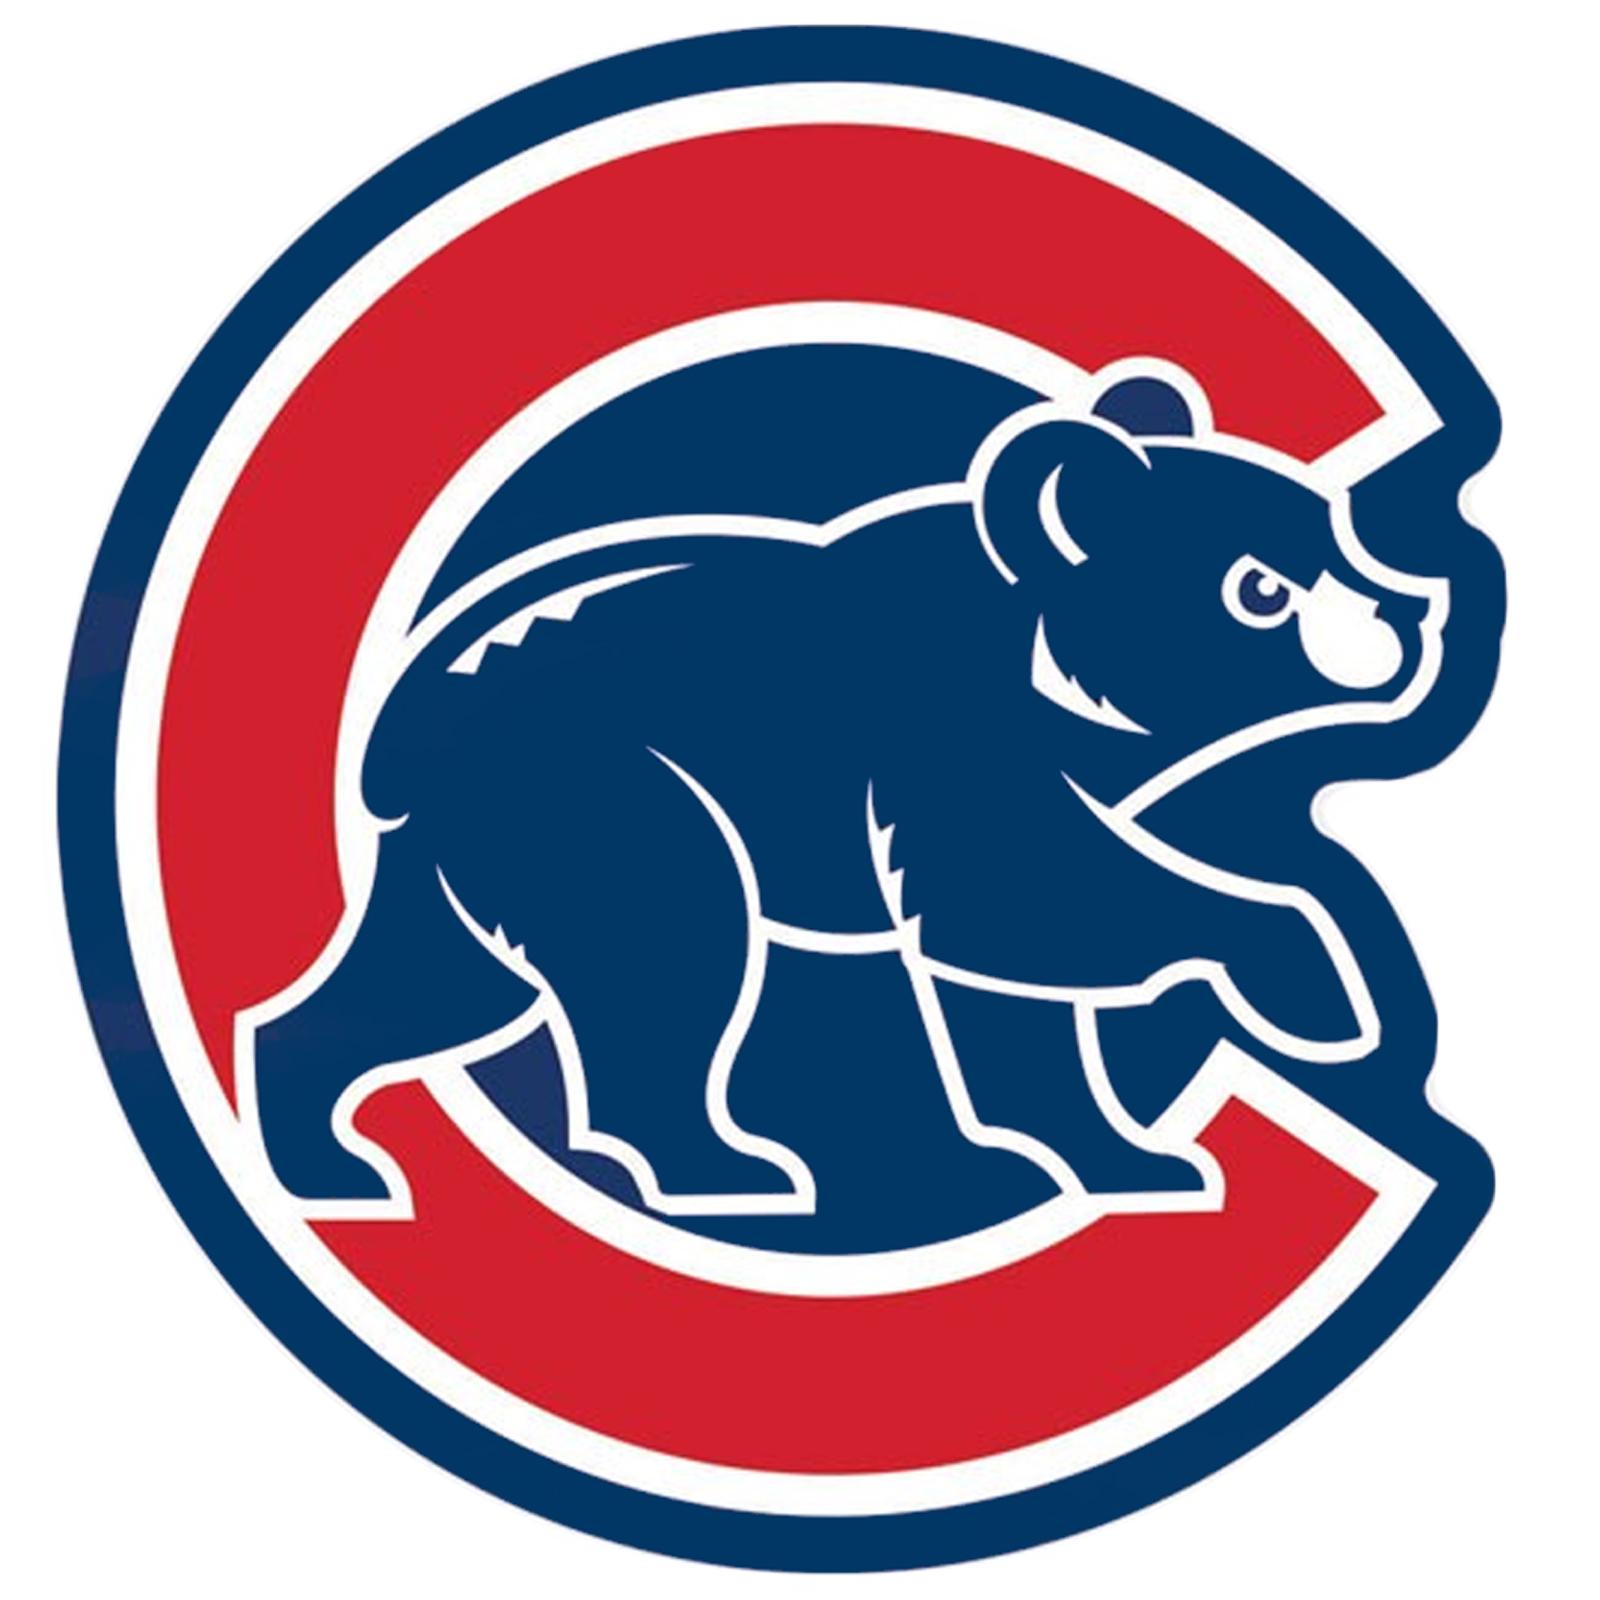 Details about Chicago Cubs MLB Baseball Alternate Walking Bear Logo Blue  Border Decal 4 x 4.